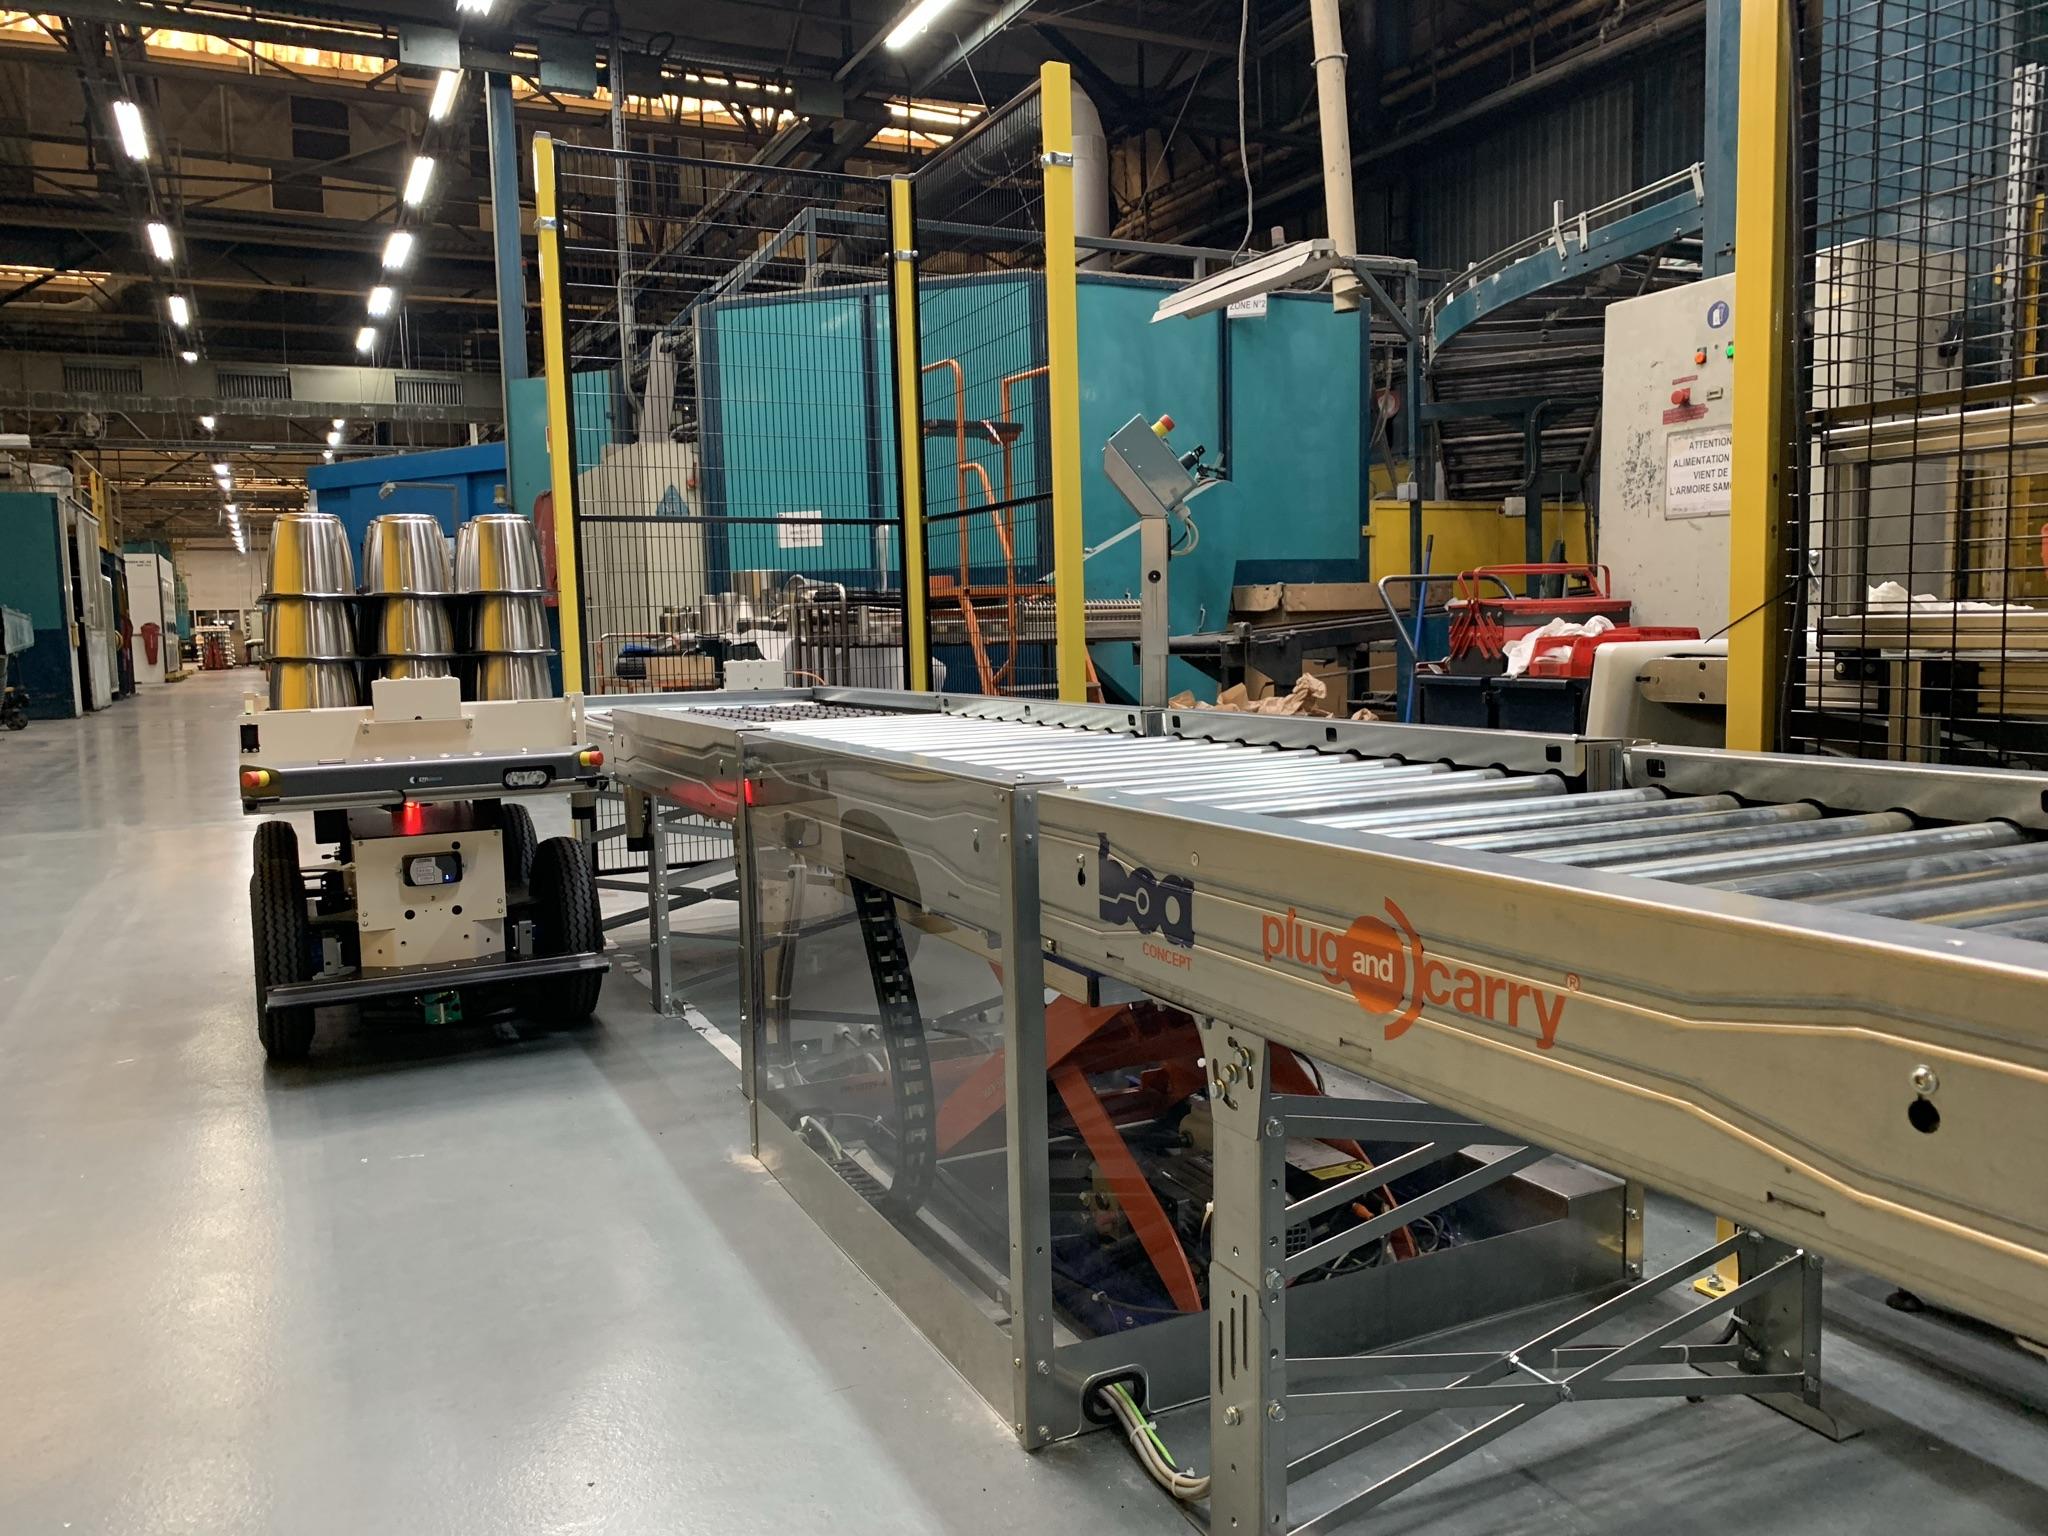 Effidencereleases Convey-LINK mobile conveyor for the EffiBOT mobile robot